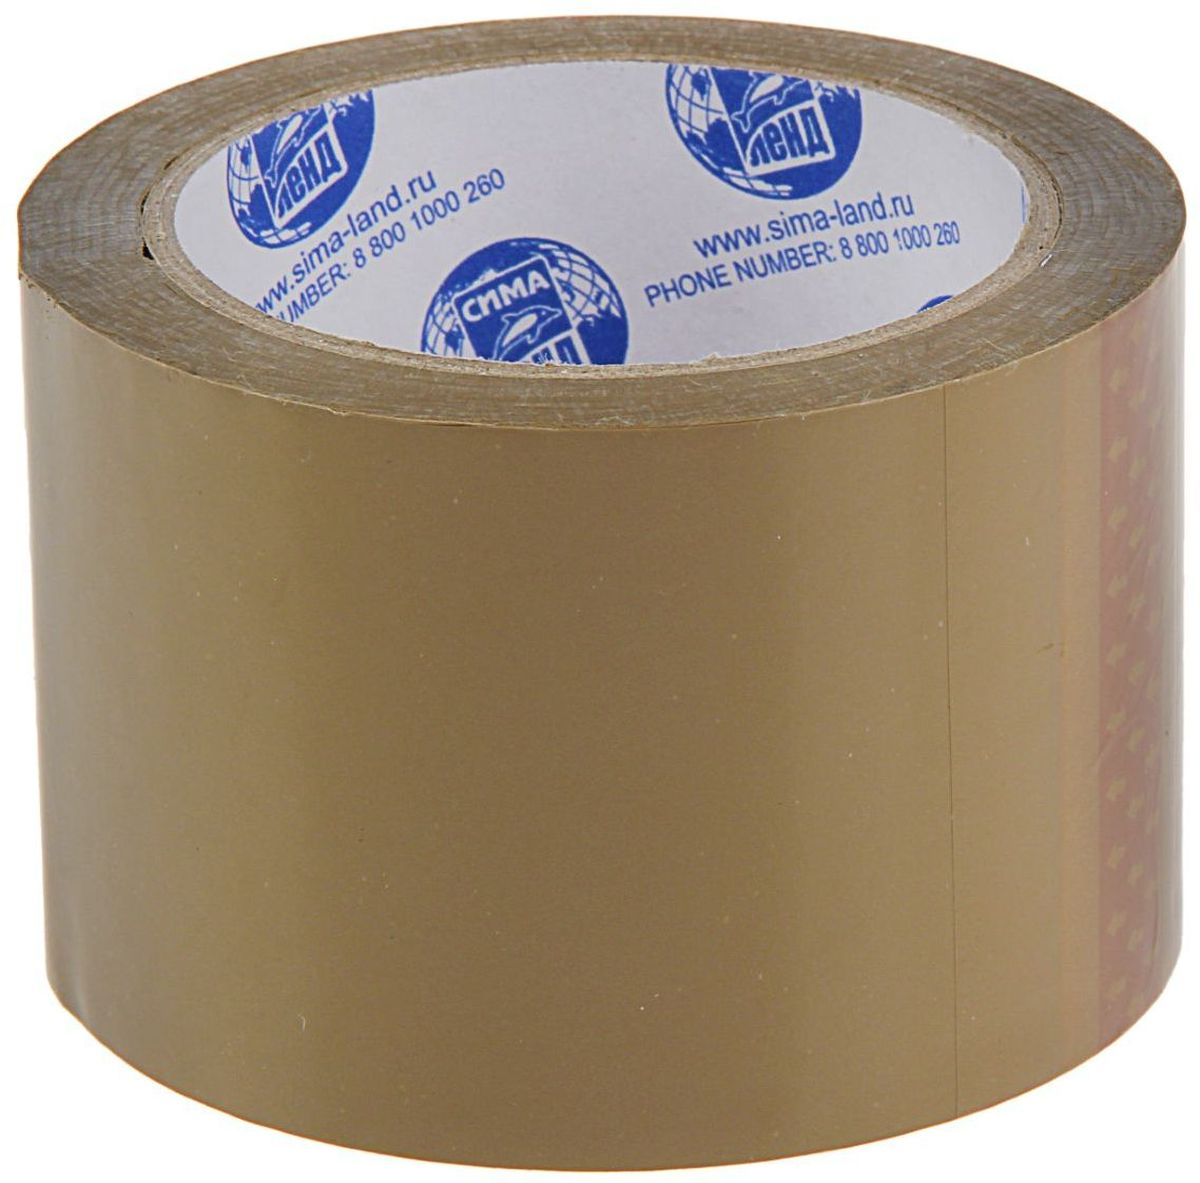 Клейкая лента 72 мм х 66 м цвет коричневый 1268214